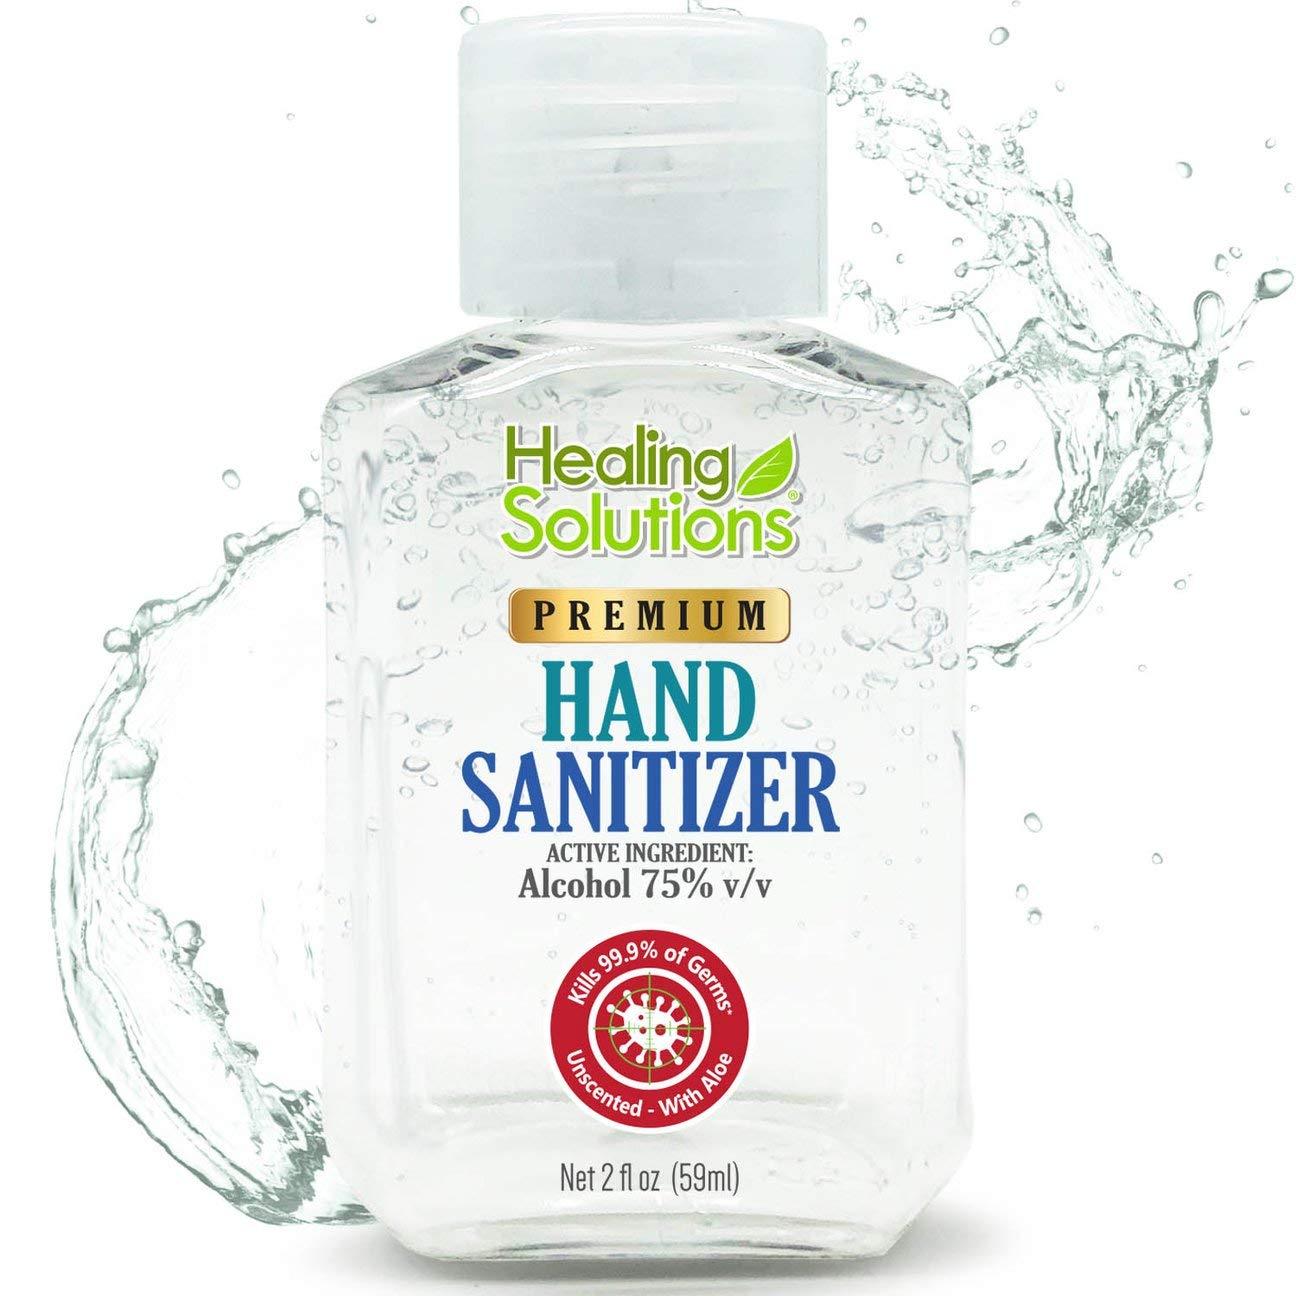 Healing Solutions Hand Sanitizer Gel